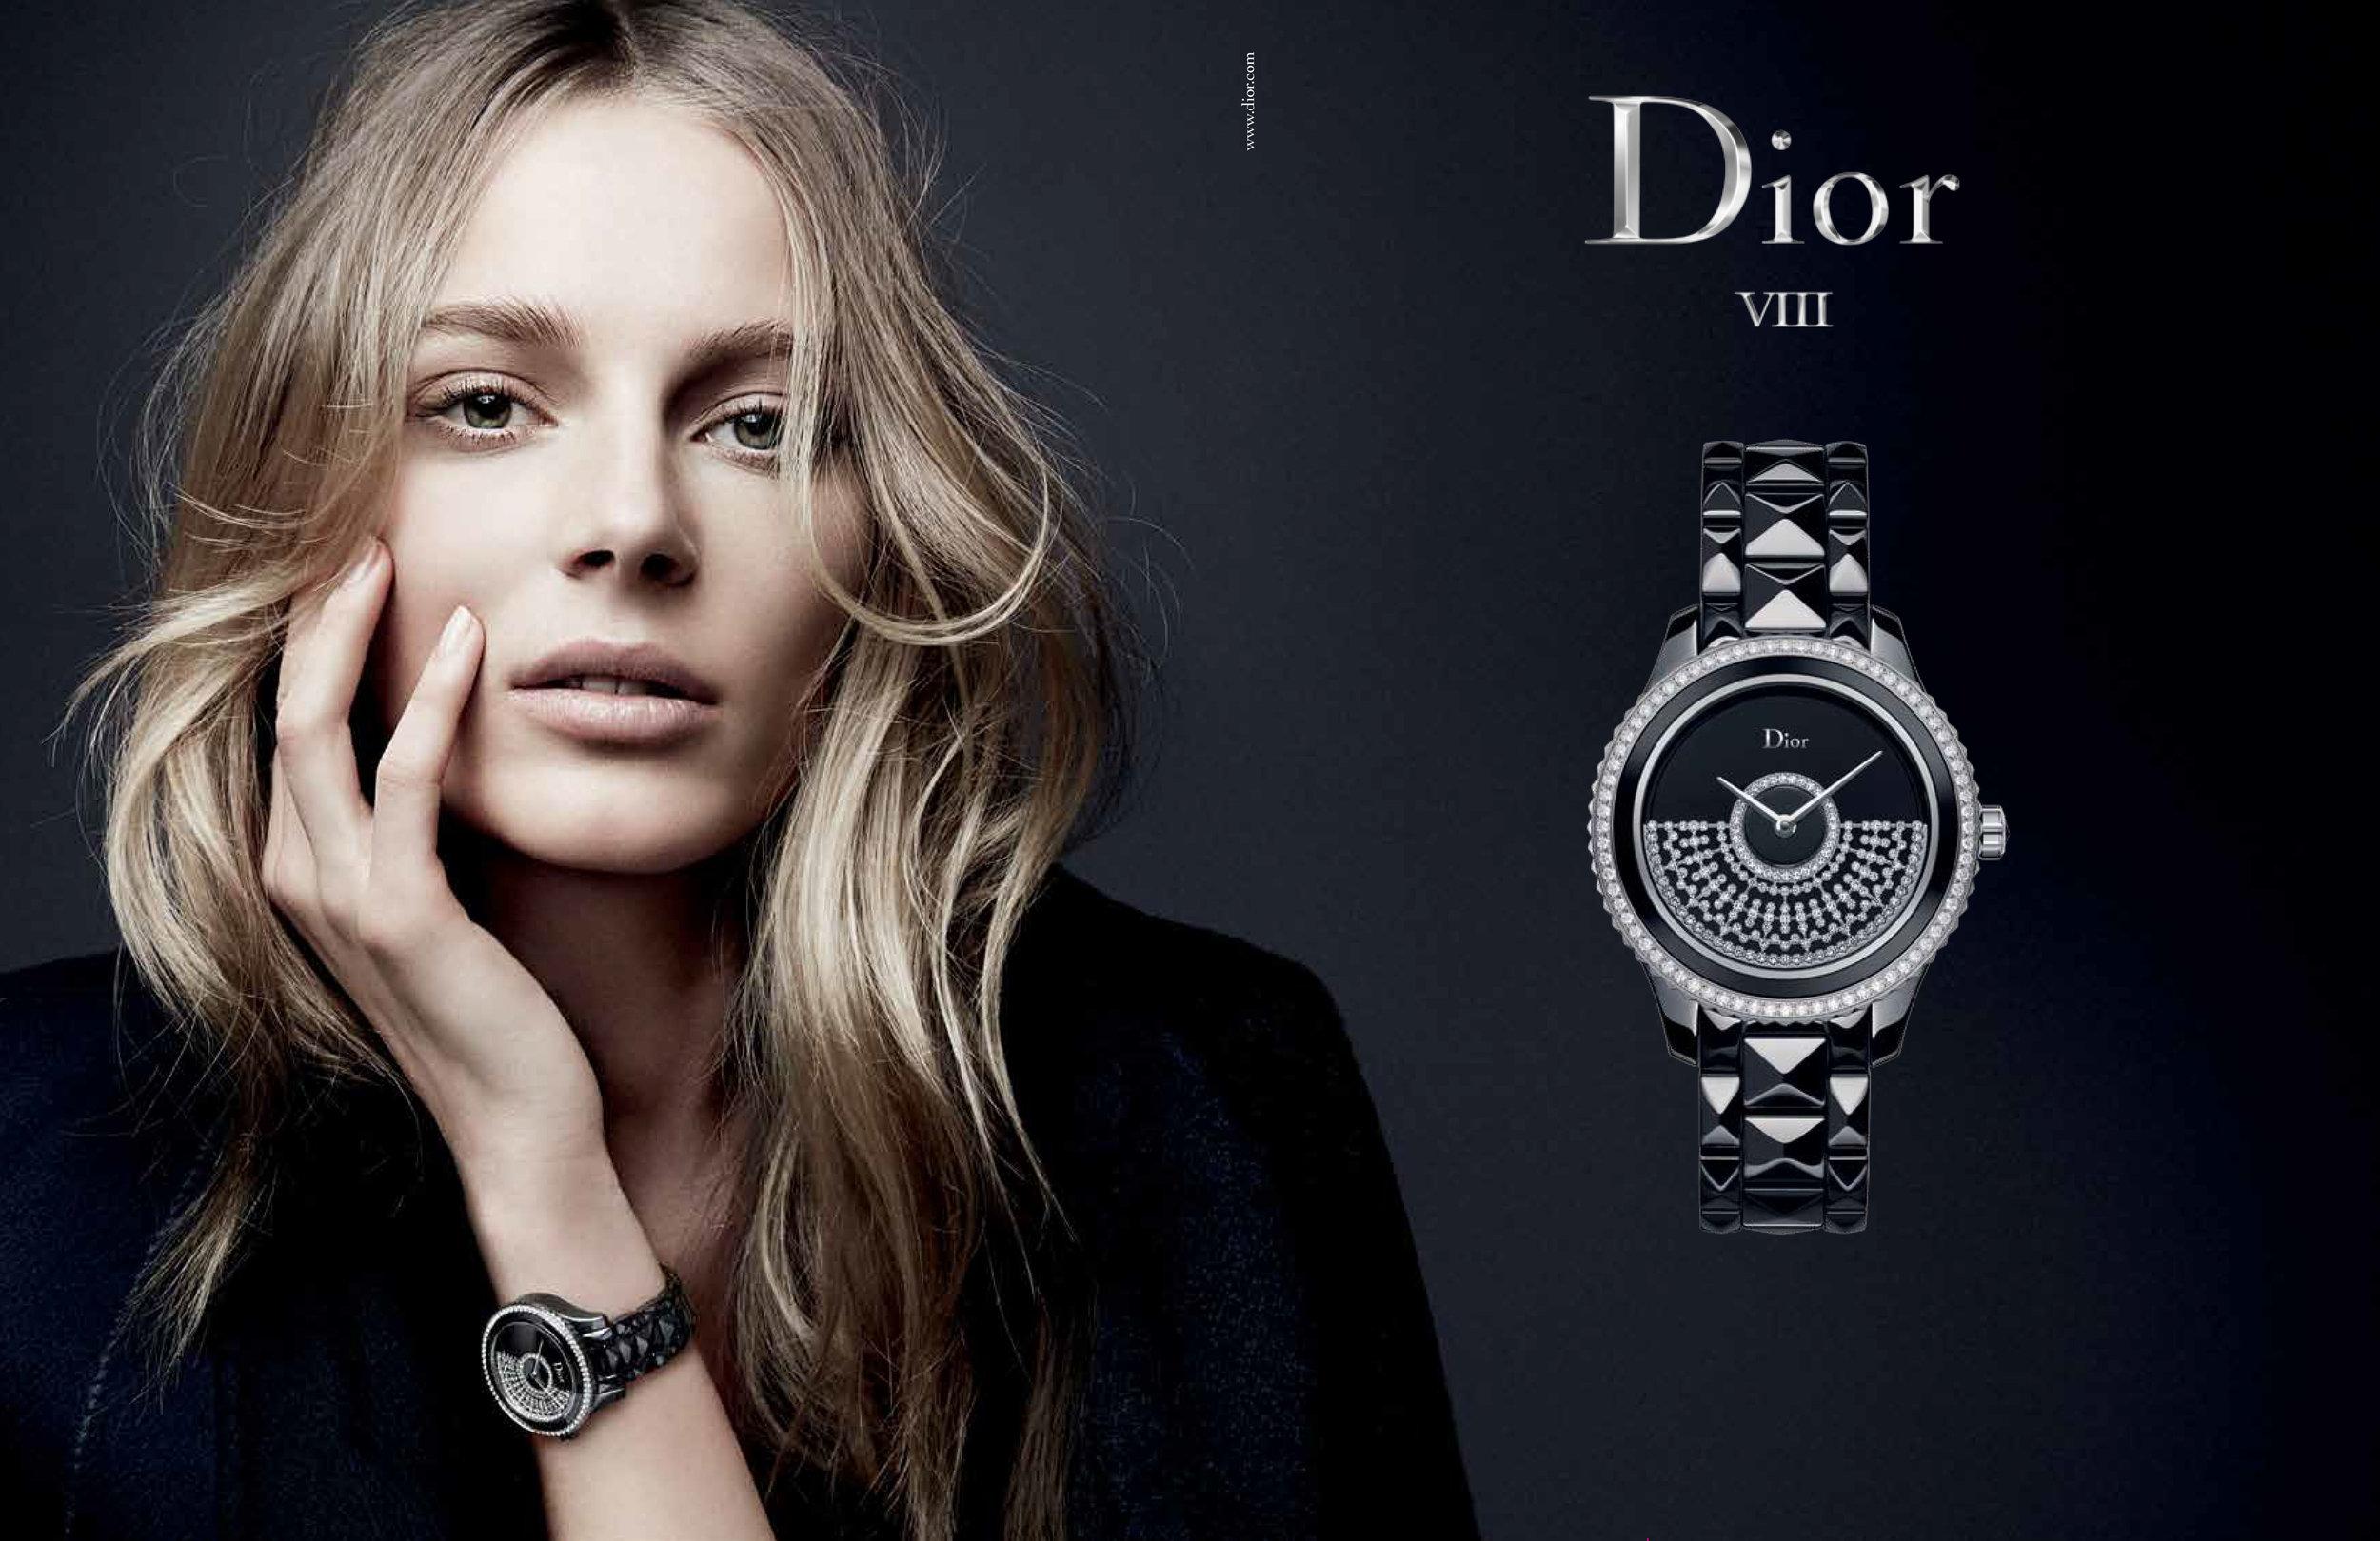 Dior Advertising